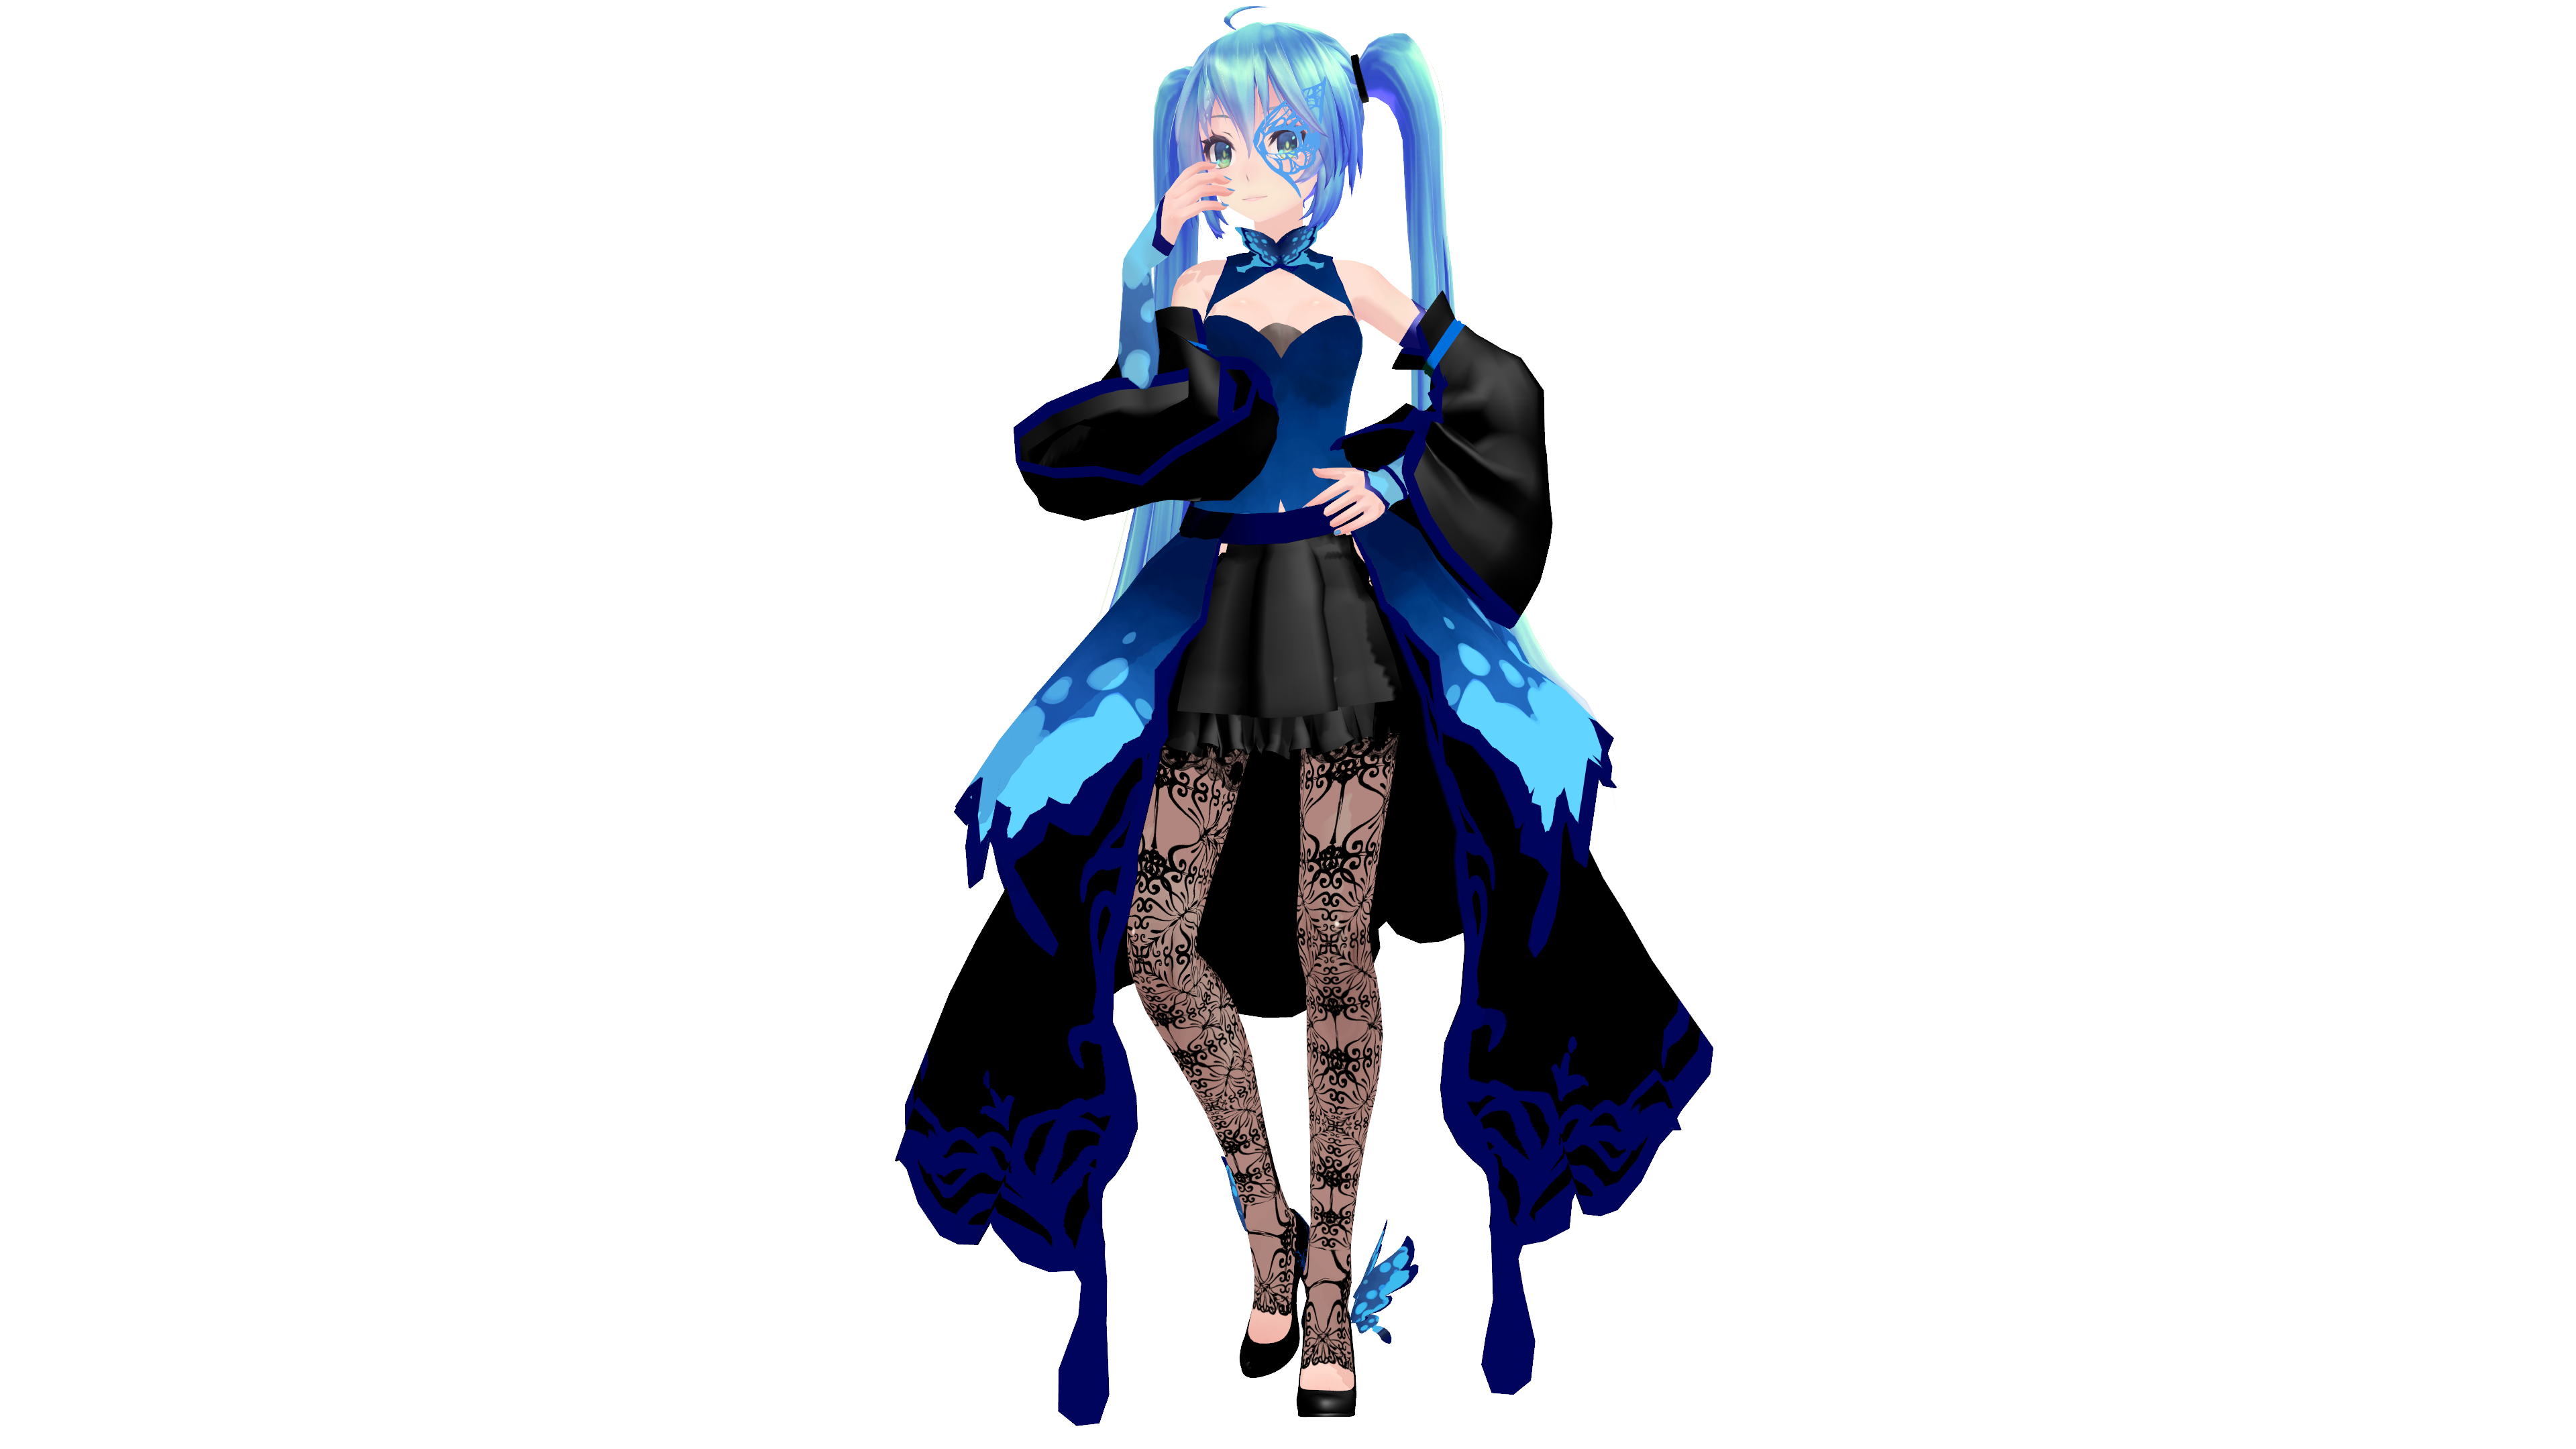 MMD Model Download: TDA Butterfly Dress Miku by K-Manoc1 on